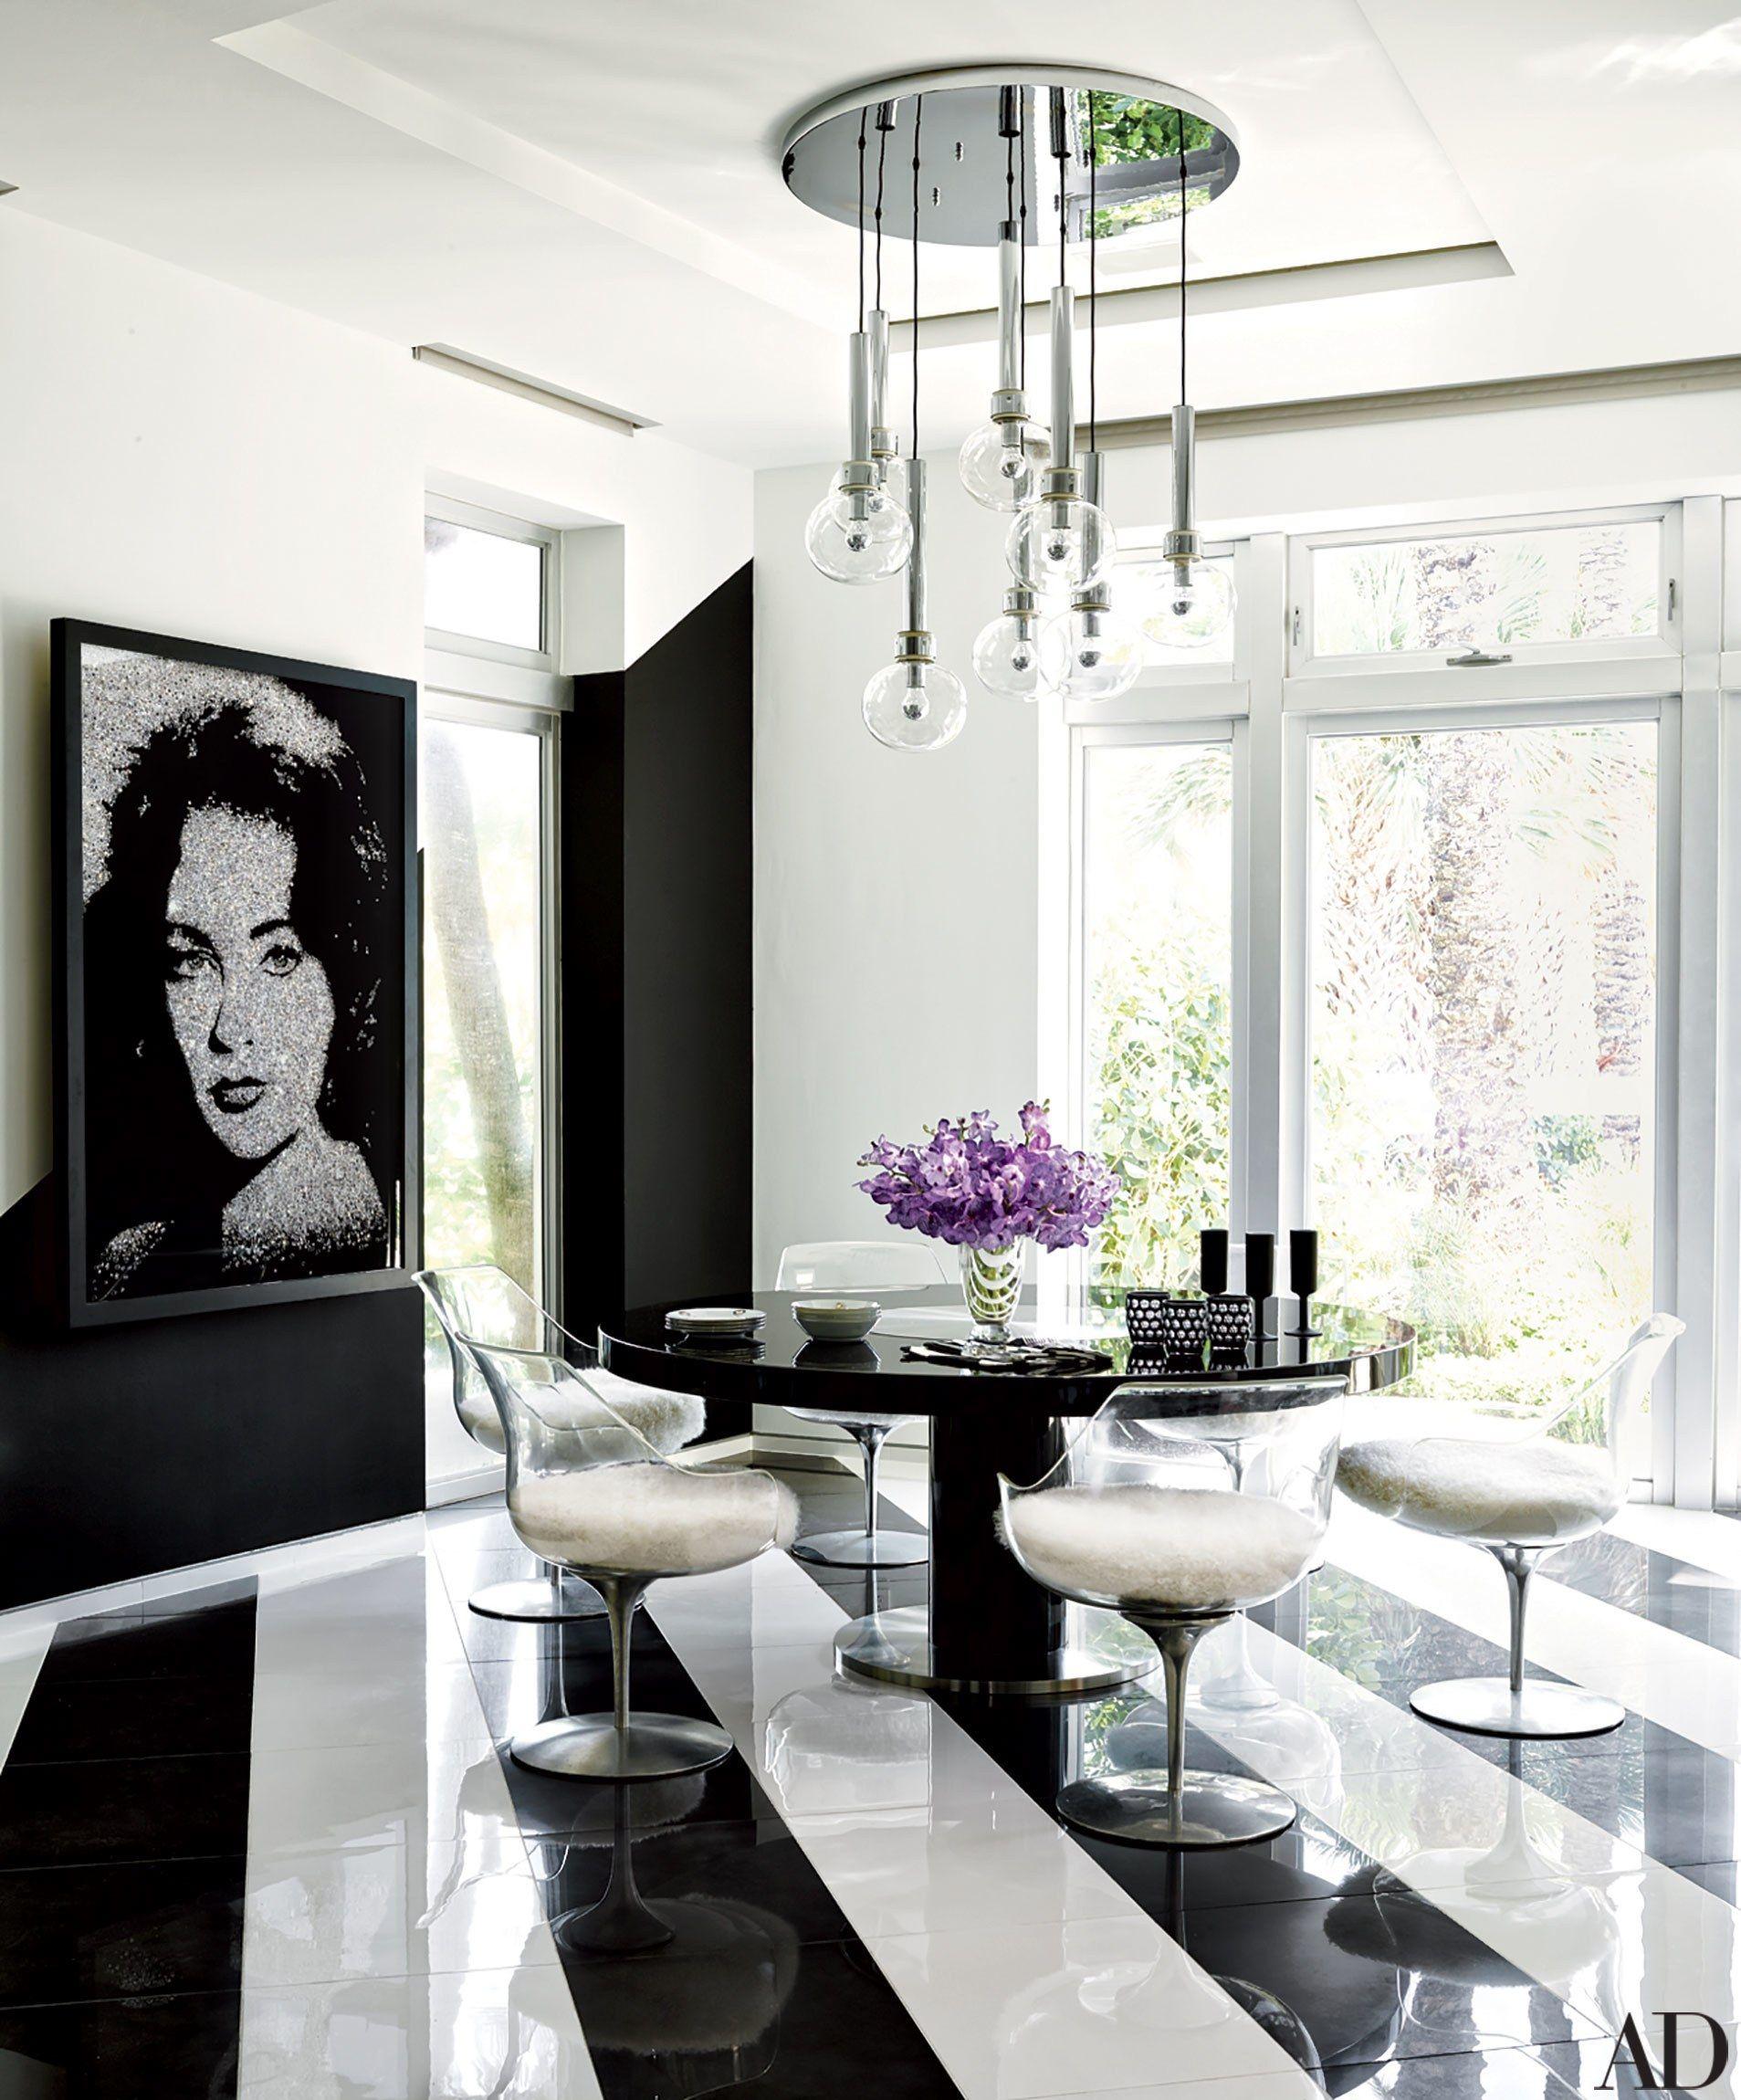 Fashion Designer Tommy Hilfigeru0027s Vibrant Home In Miami. Miami HomesTommy  HilfigerWhite Dining RoomsBlack ...